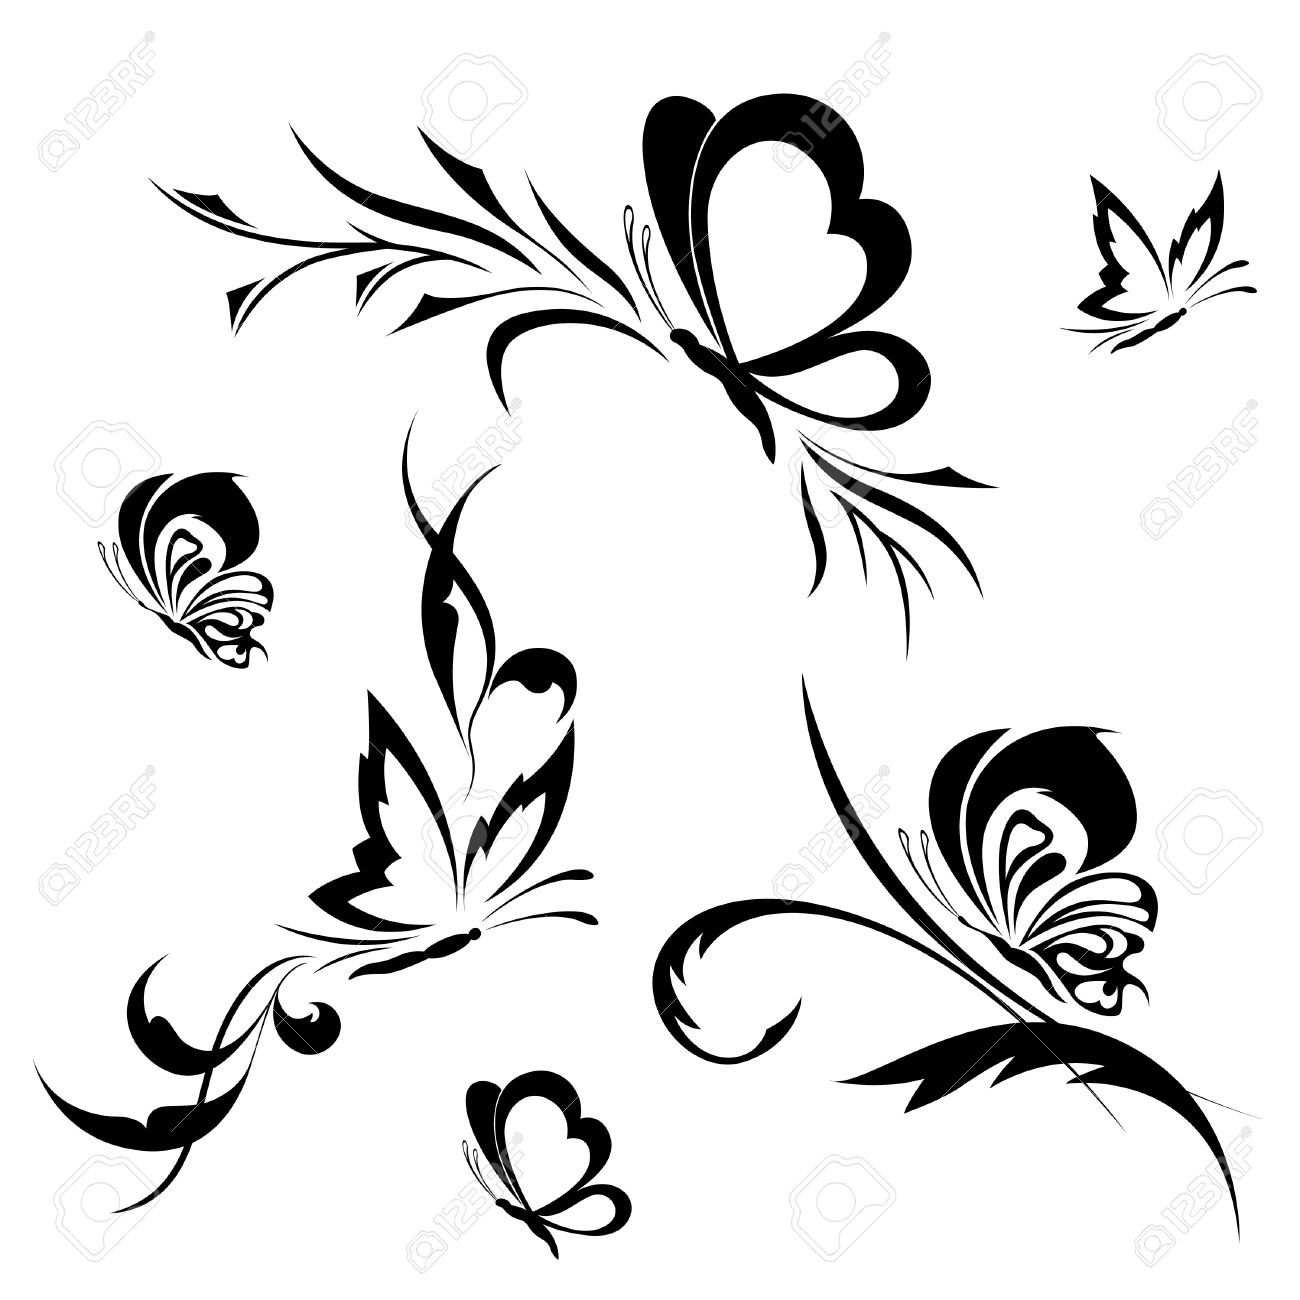 Butterflies with a flower pattern Stock Vector - 8384765